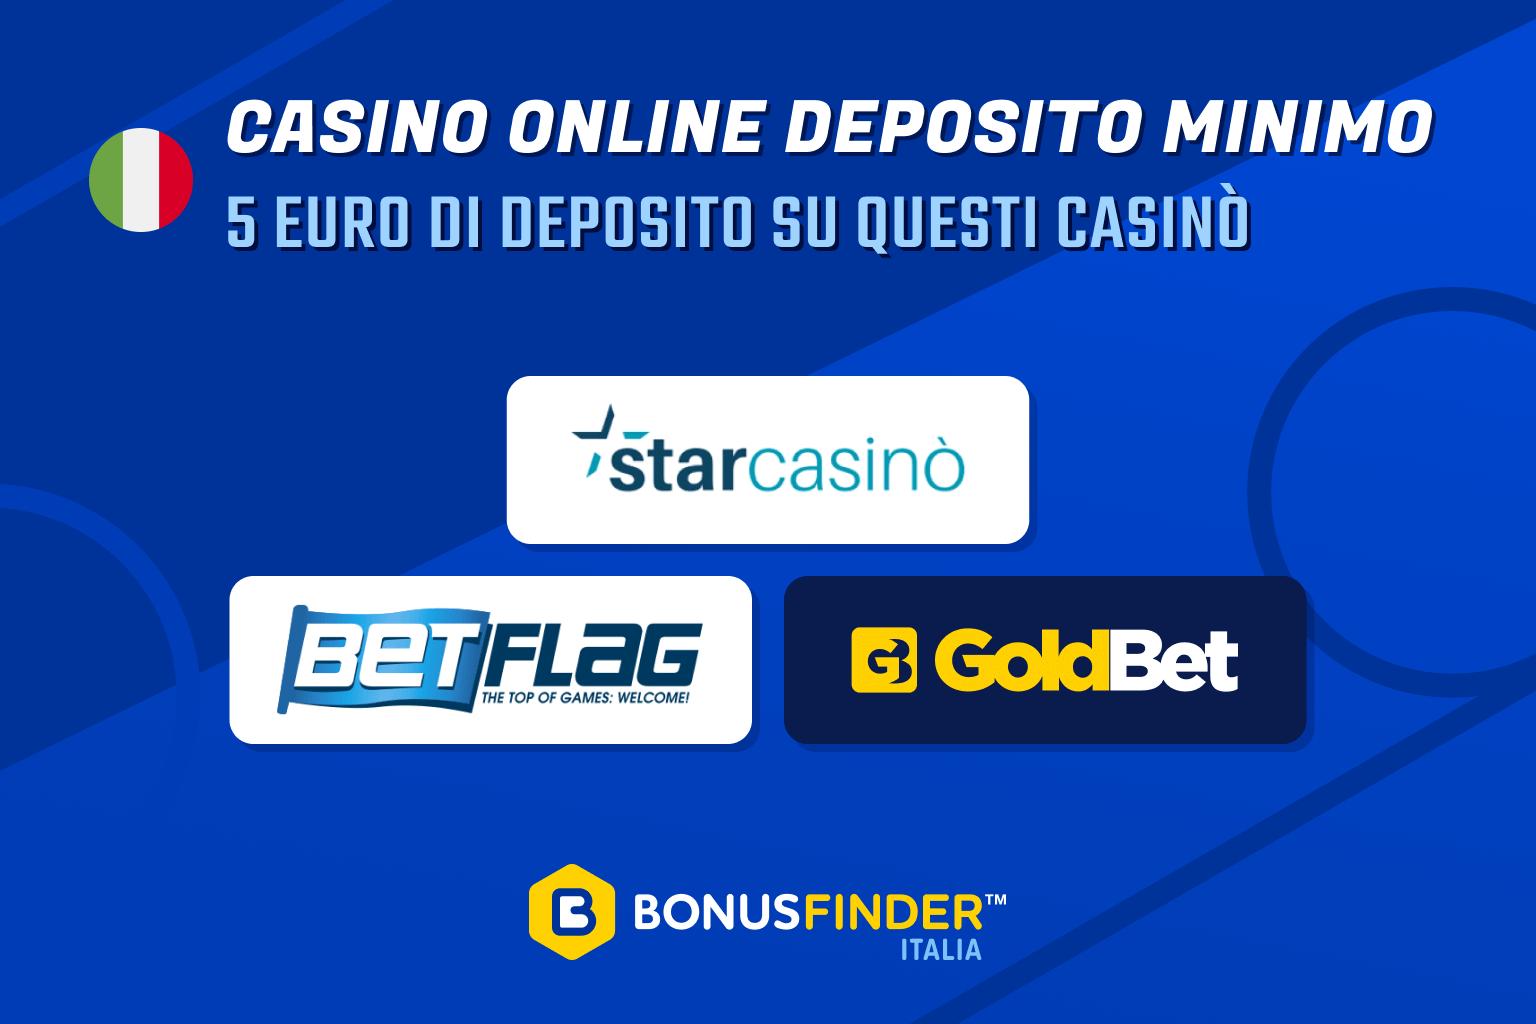 casino online deposito minimo